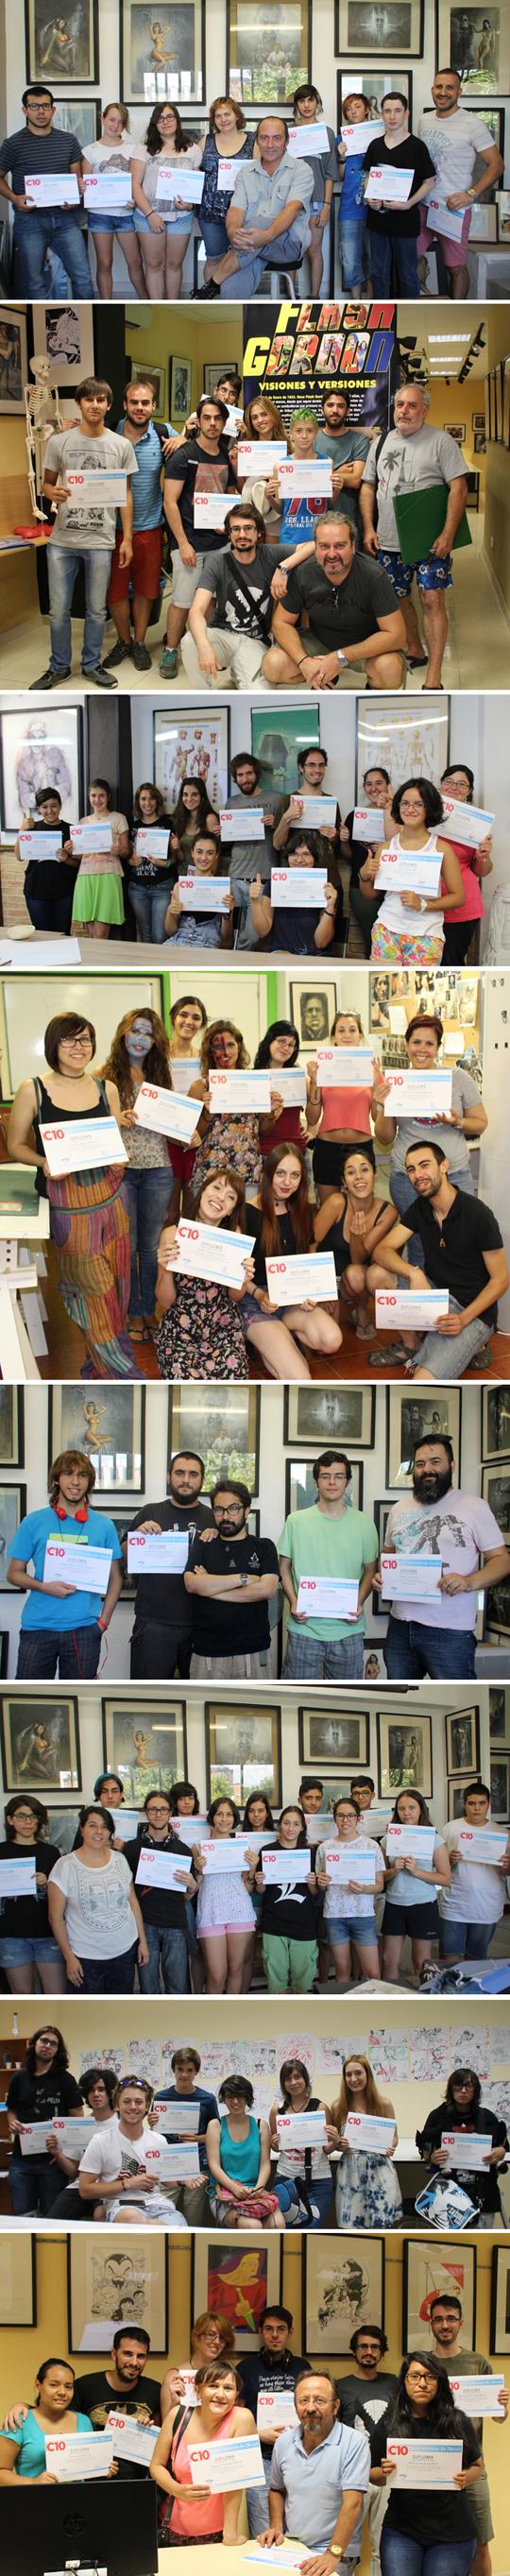 cursos_anuales_foto_alumnos_intensivos_madrid_academiac10_dibujo_comic_aerografia_guion